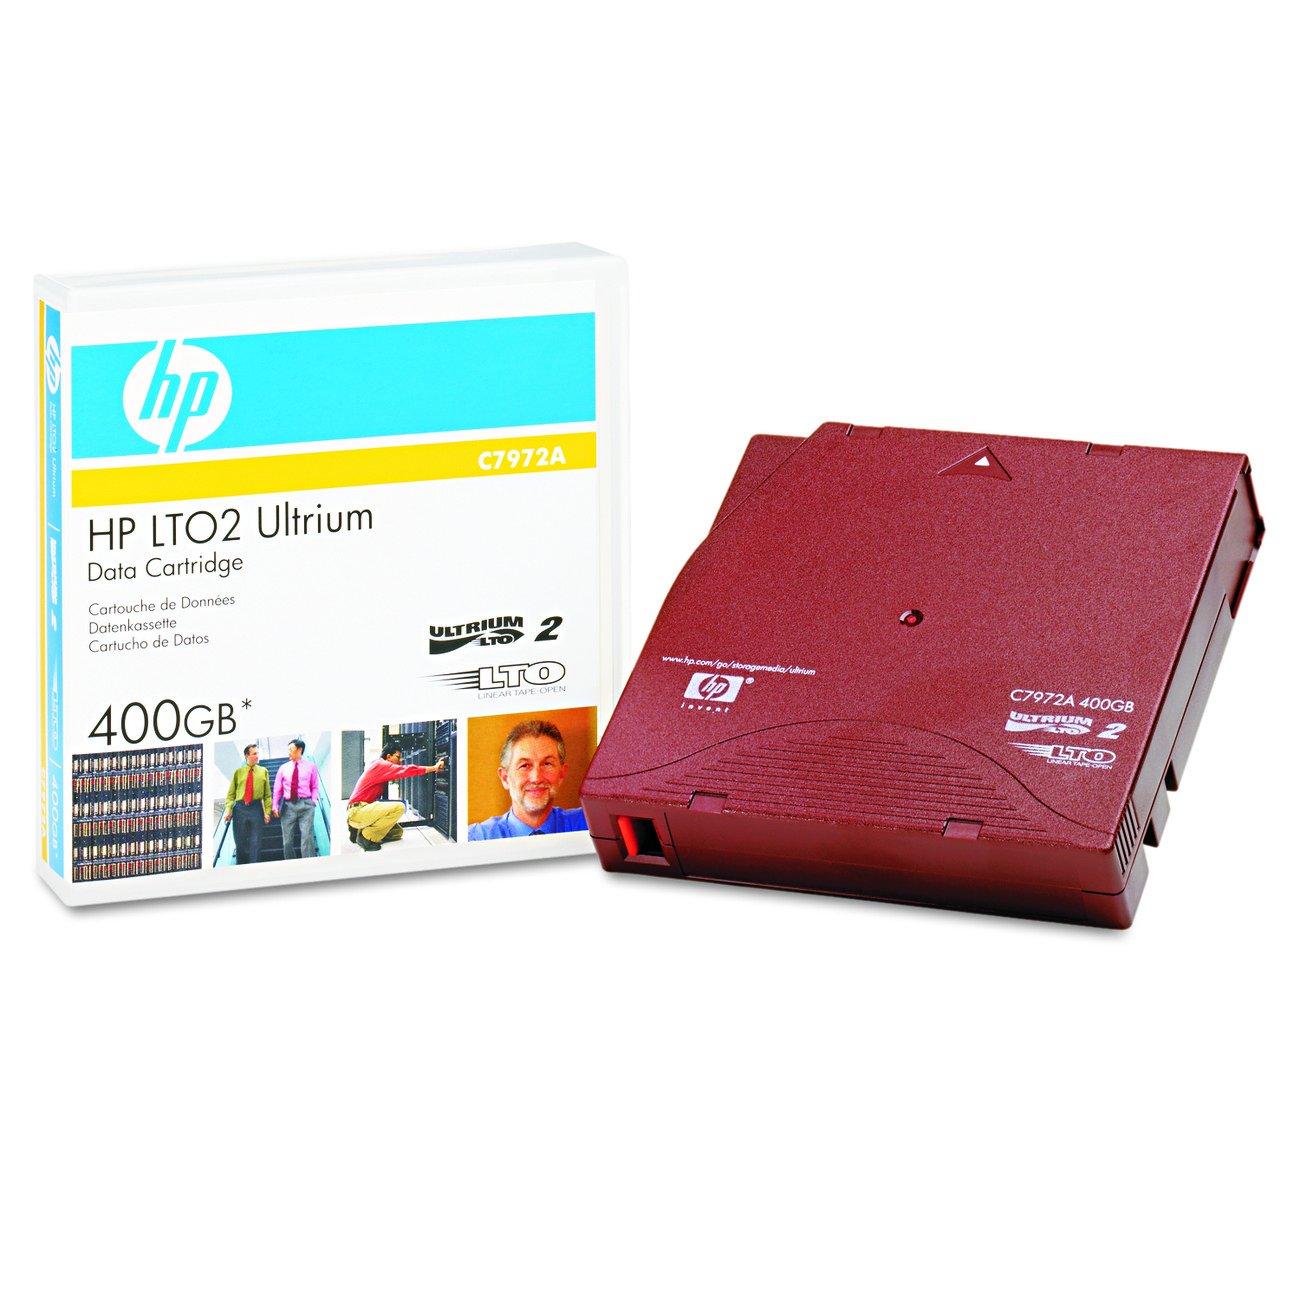 HP 1pk Lto1 Ultrium 100/200gb Tape Cartridge Hewlett Packard HEWC7971A 103580 Blank Media & Cleaning Cartridges